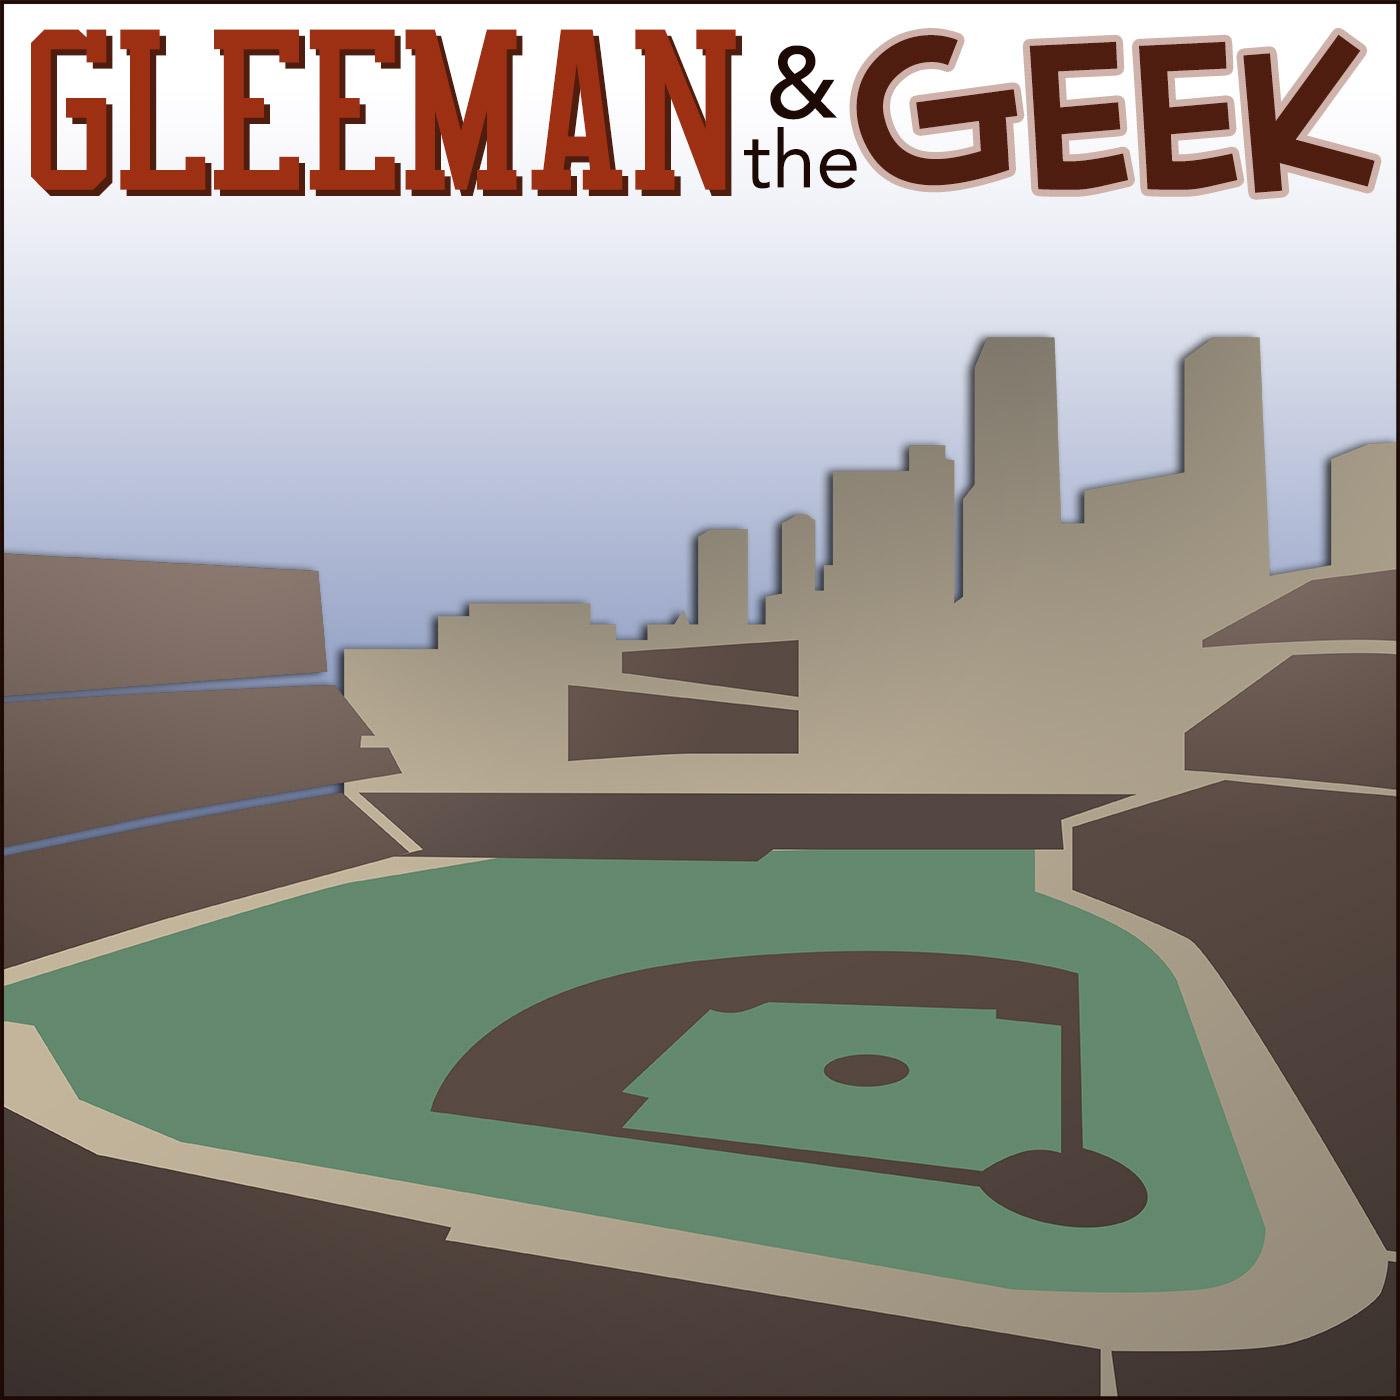 Gleeman and The Geek - An Unauthorized Minnesota Twins Podcast show art